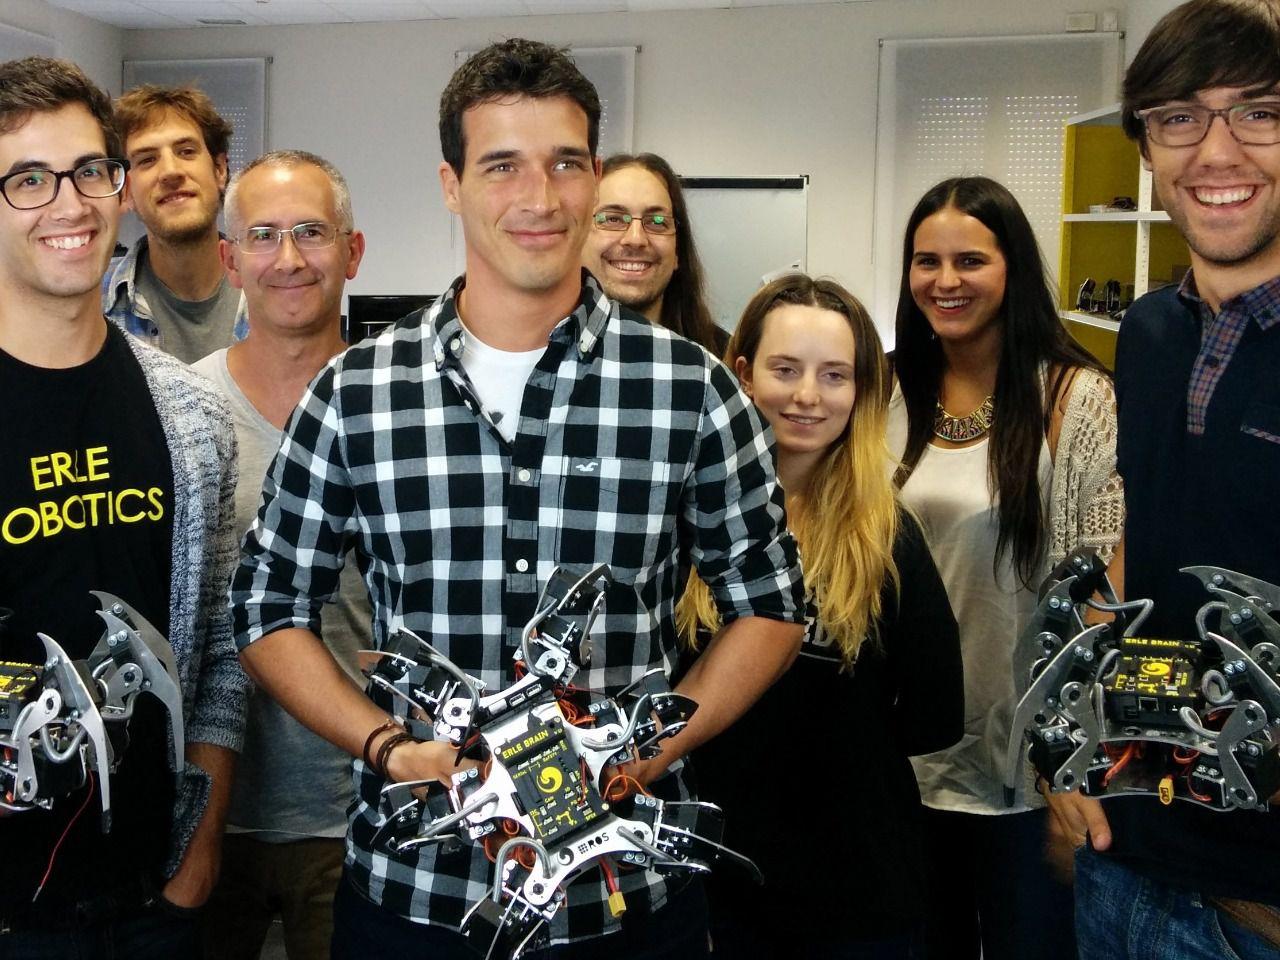 Una joven empresa vasca lanza la primera araña robótica de España